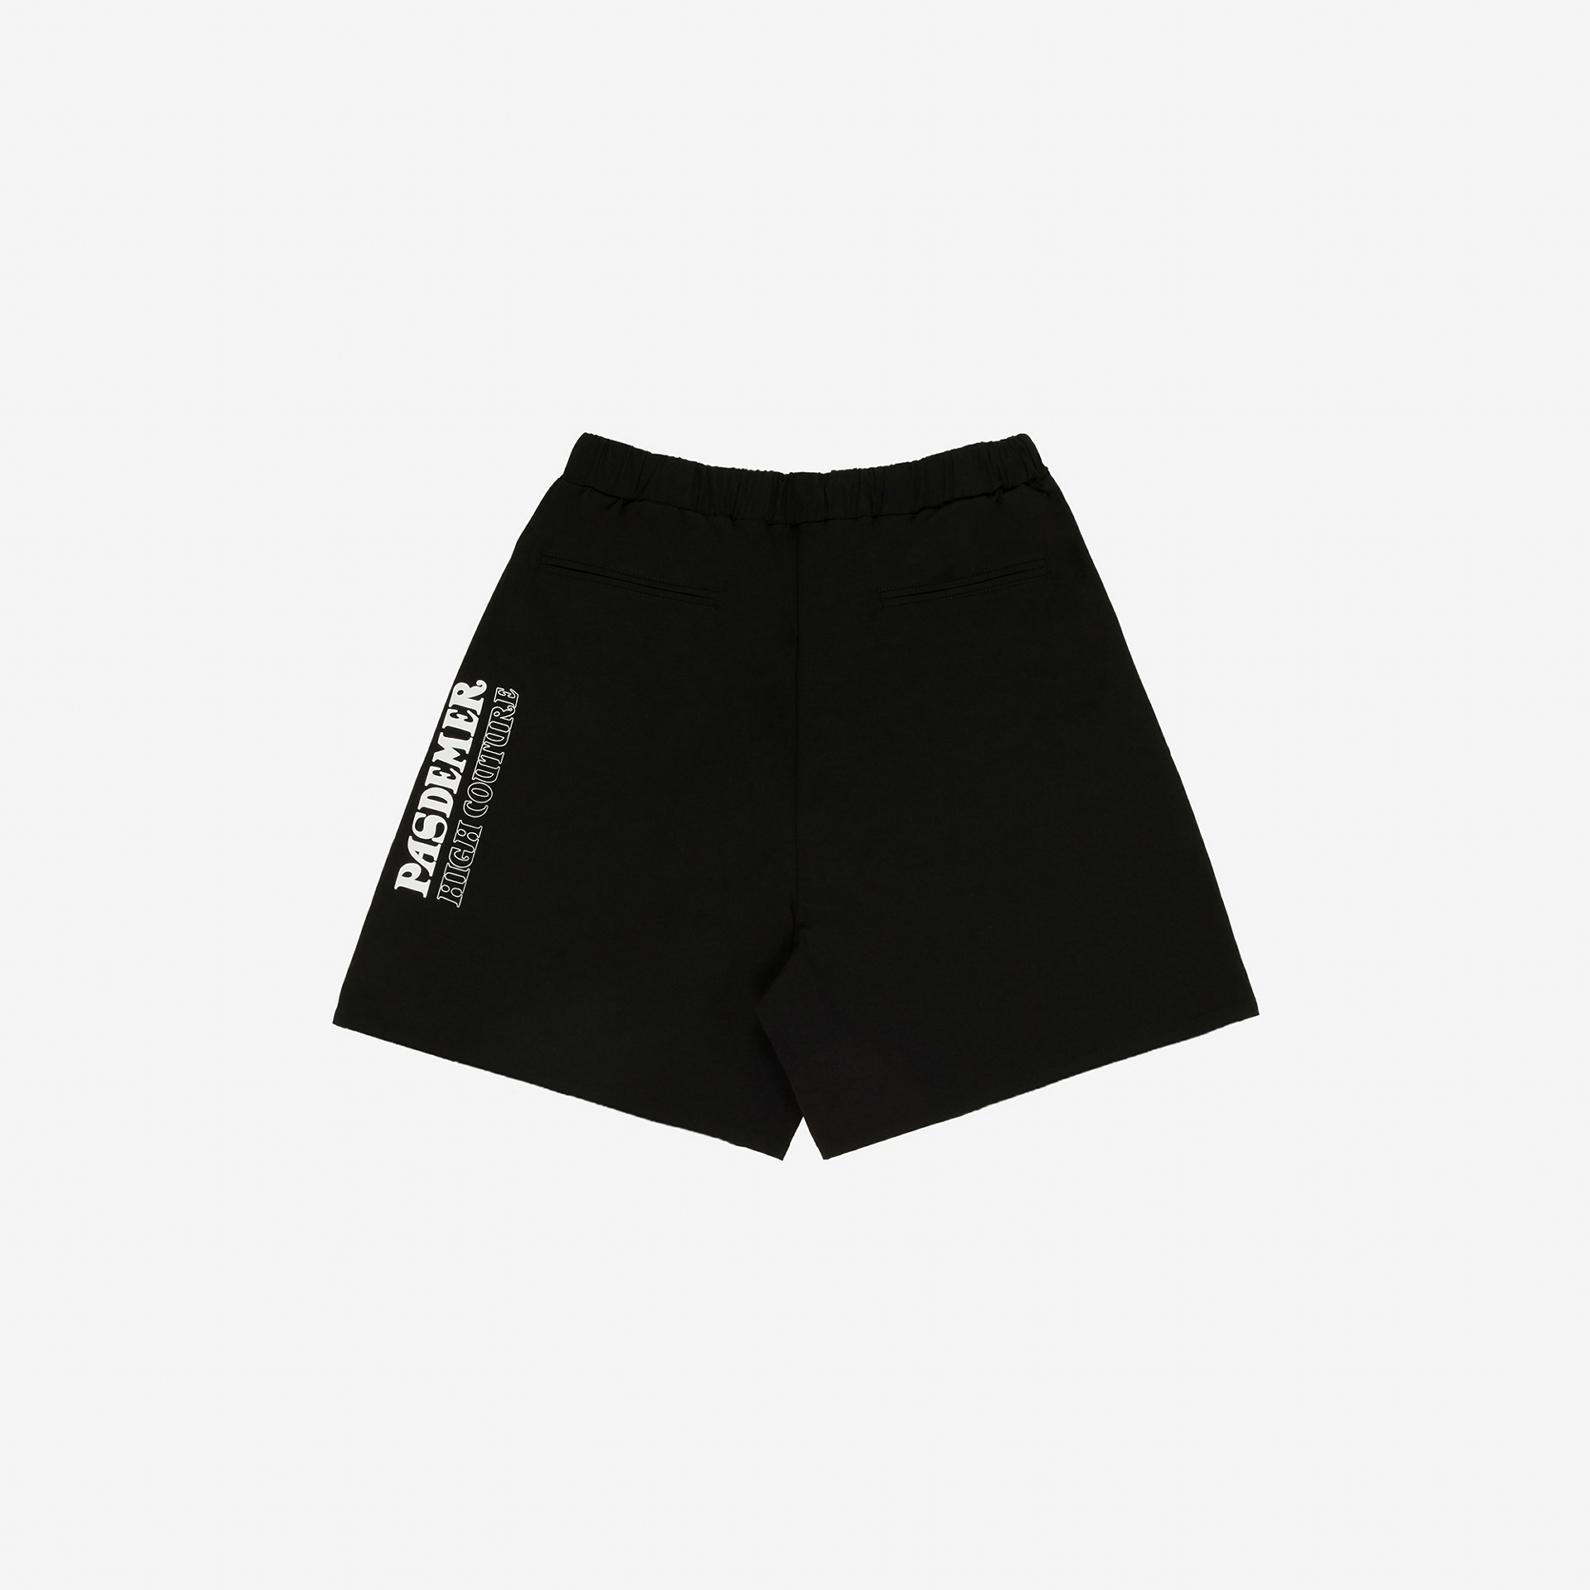 【PAS DE MER/パドゥメ】HIGH COUTURE SHORTS ショートパンツ / BLACK